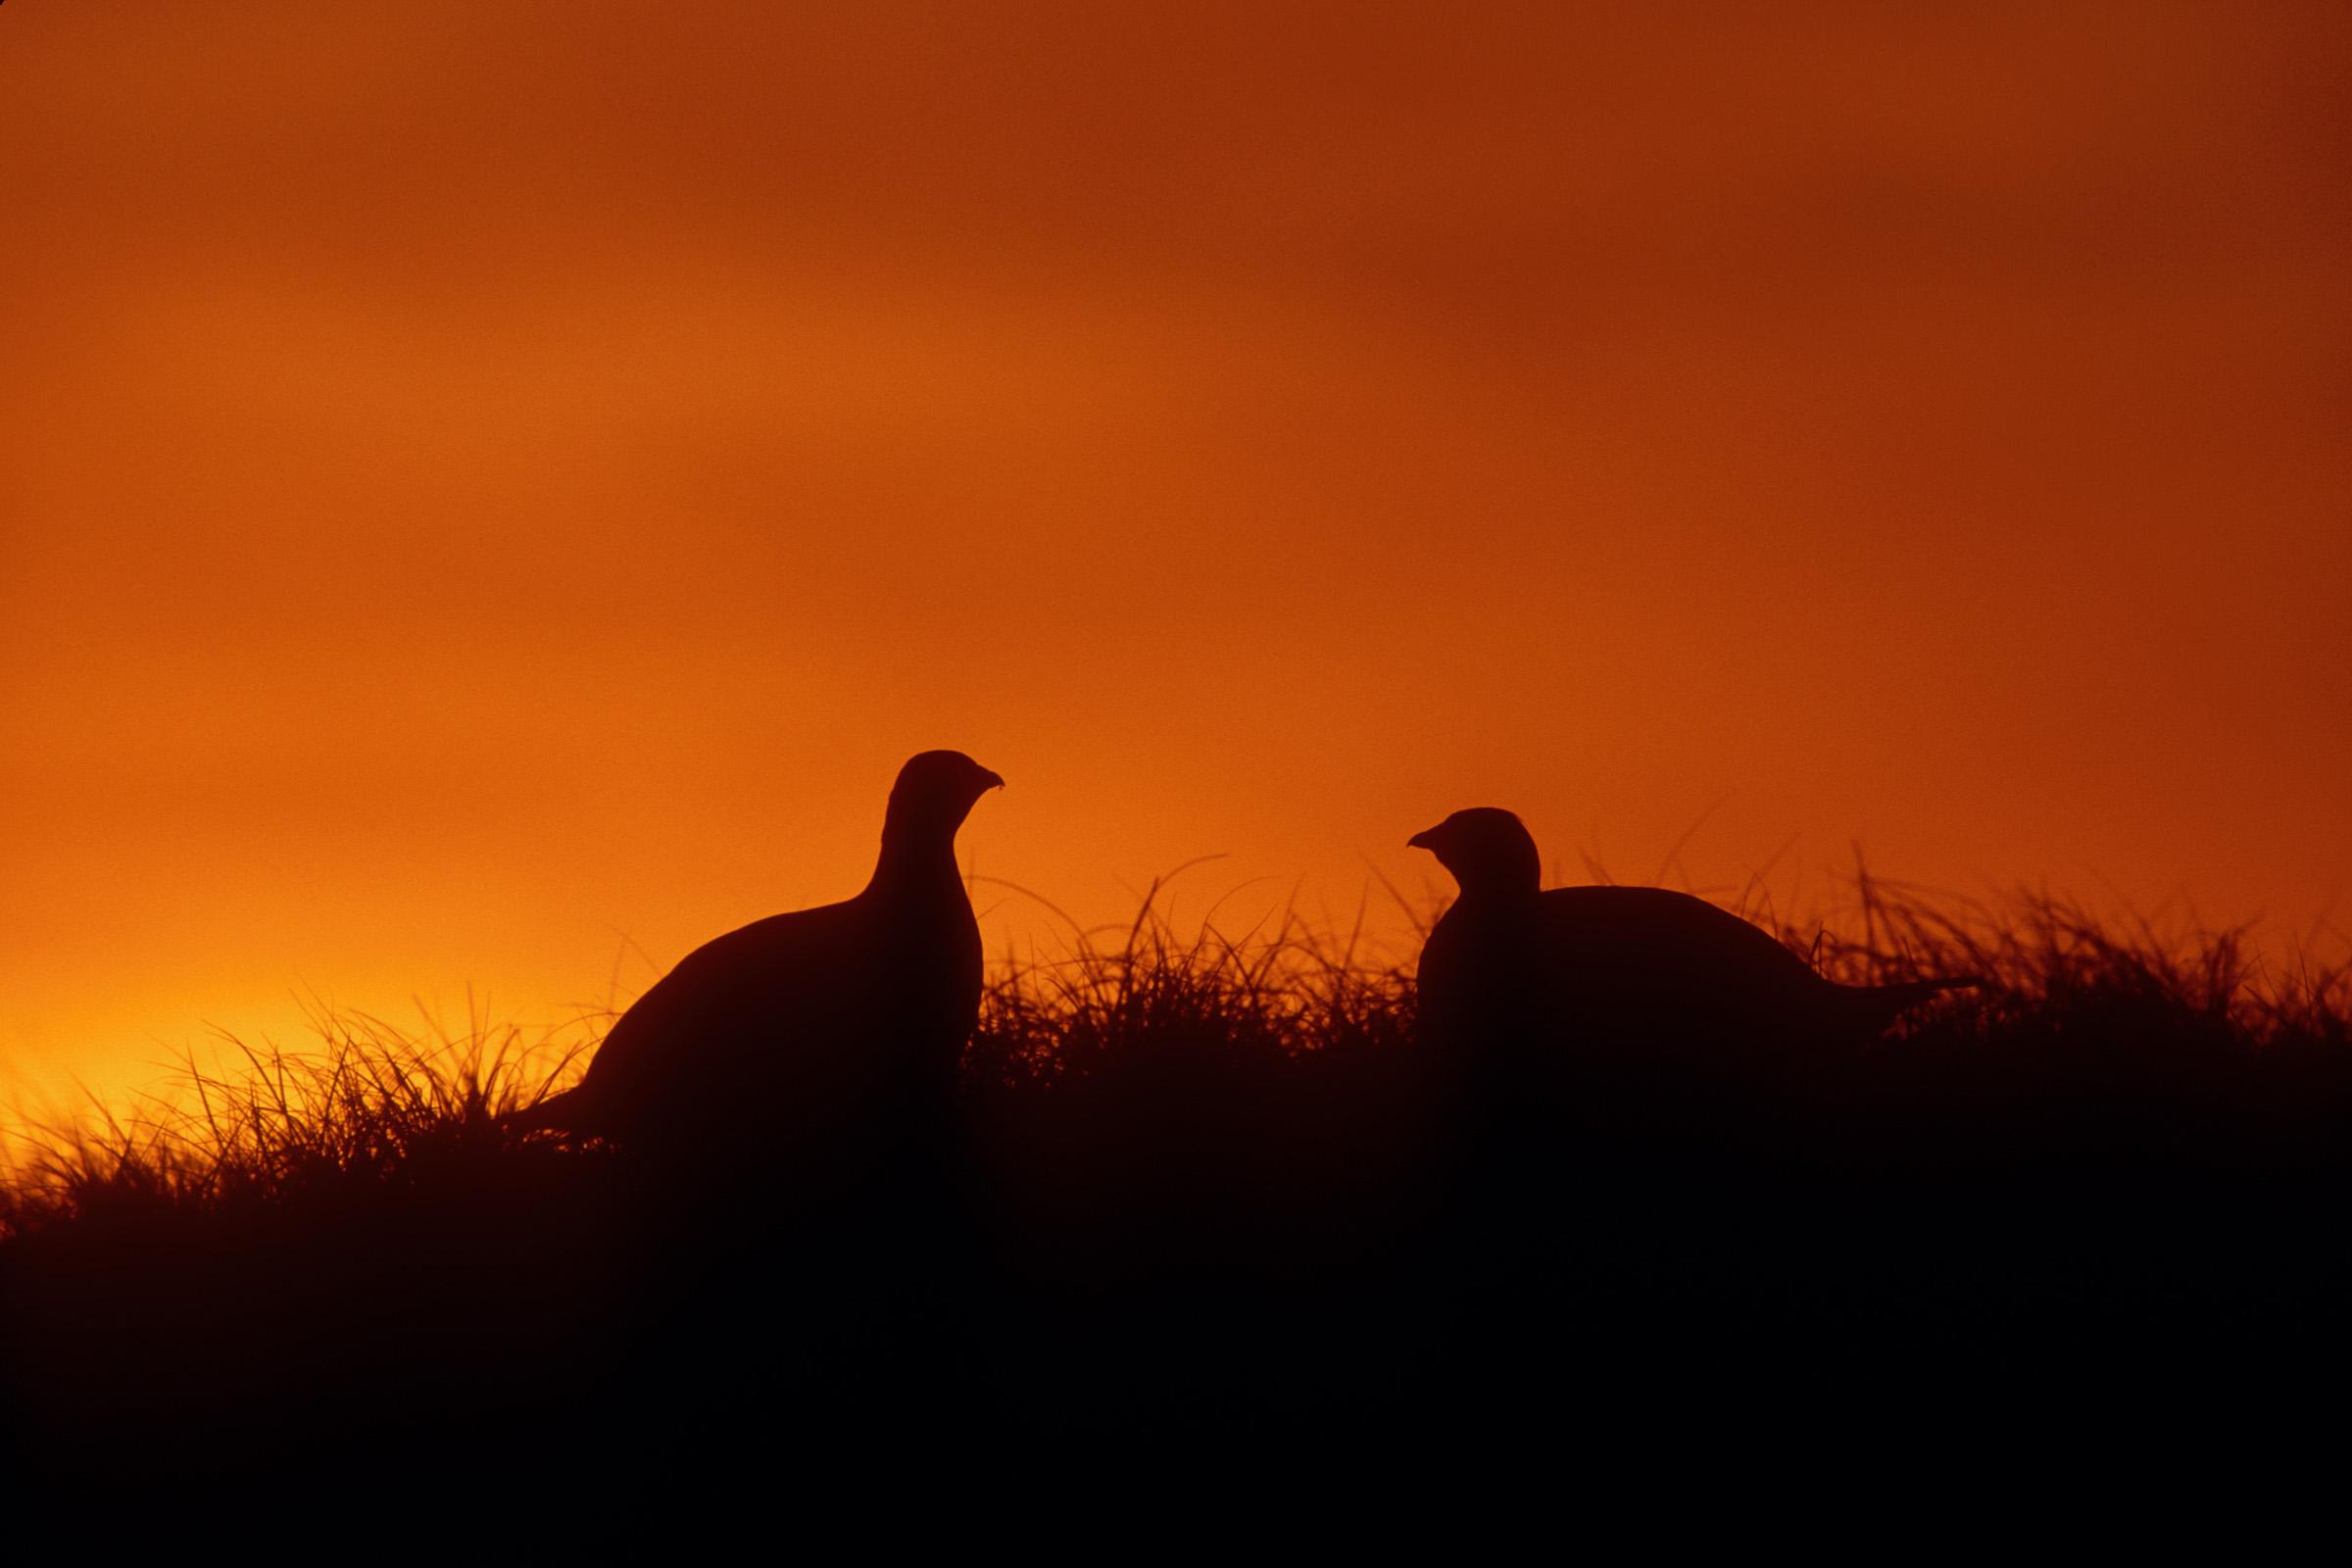 Prairie Sharp-tailed Grouse by Baetsen.